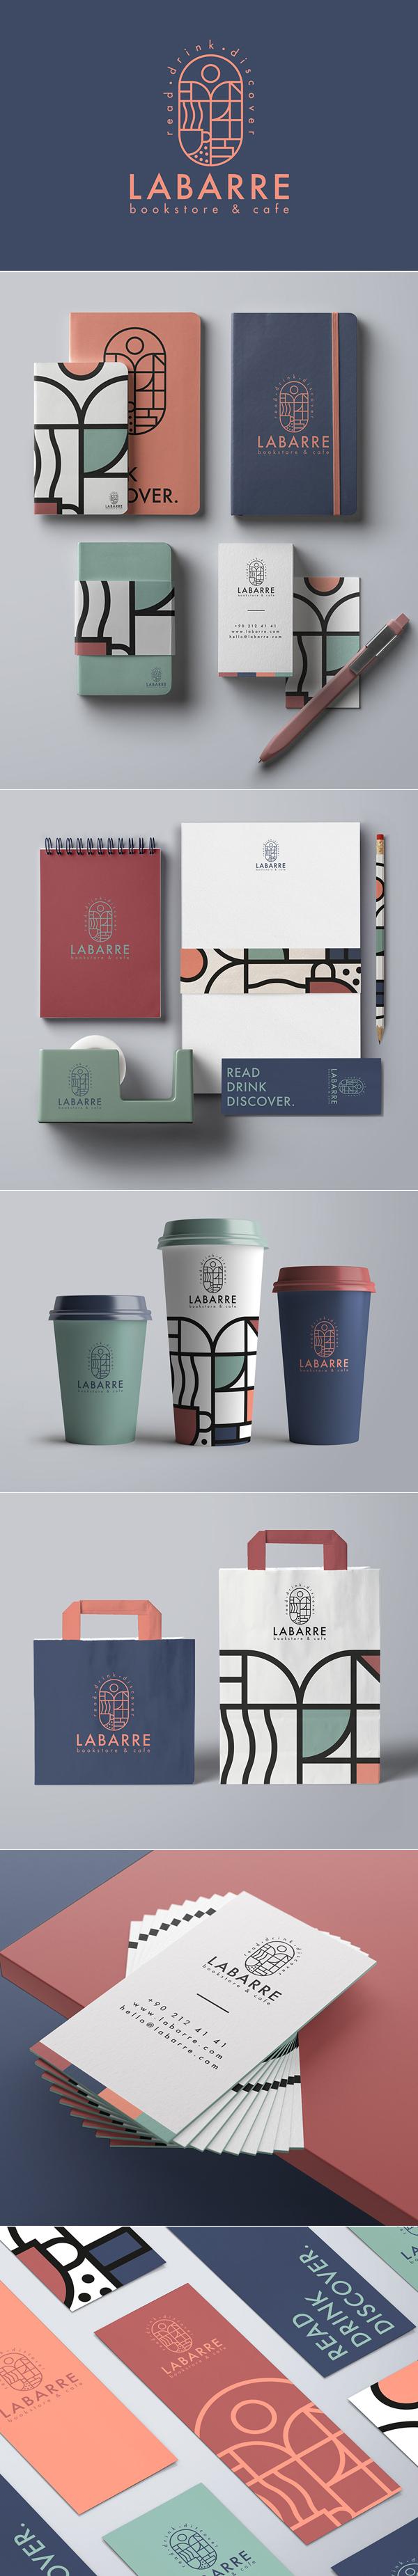 Branding: Labarre Bookstore & Cafe Branding Design by ONTO Design Studio